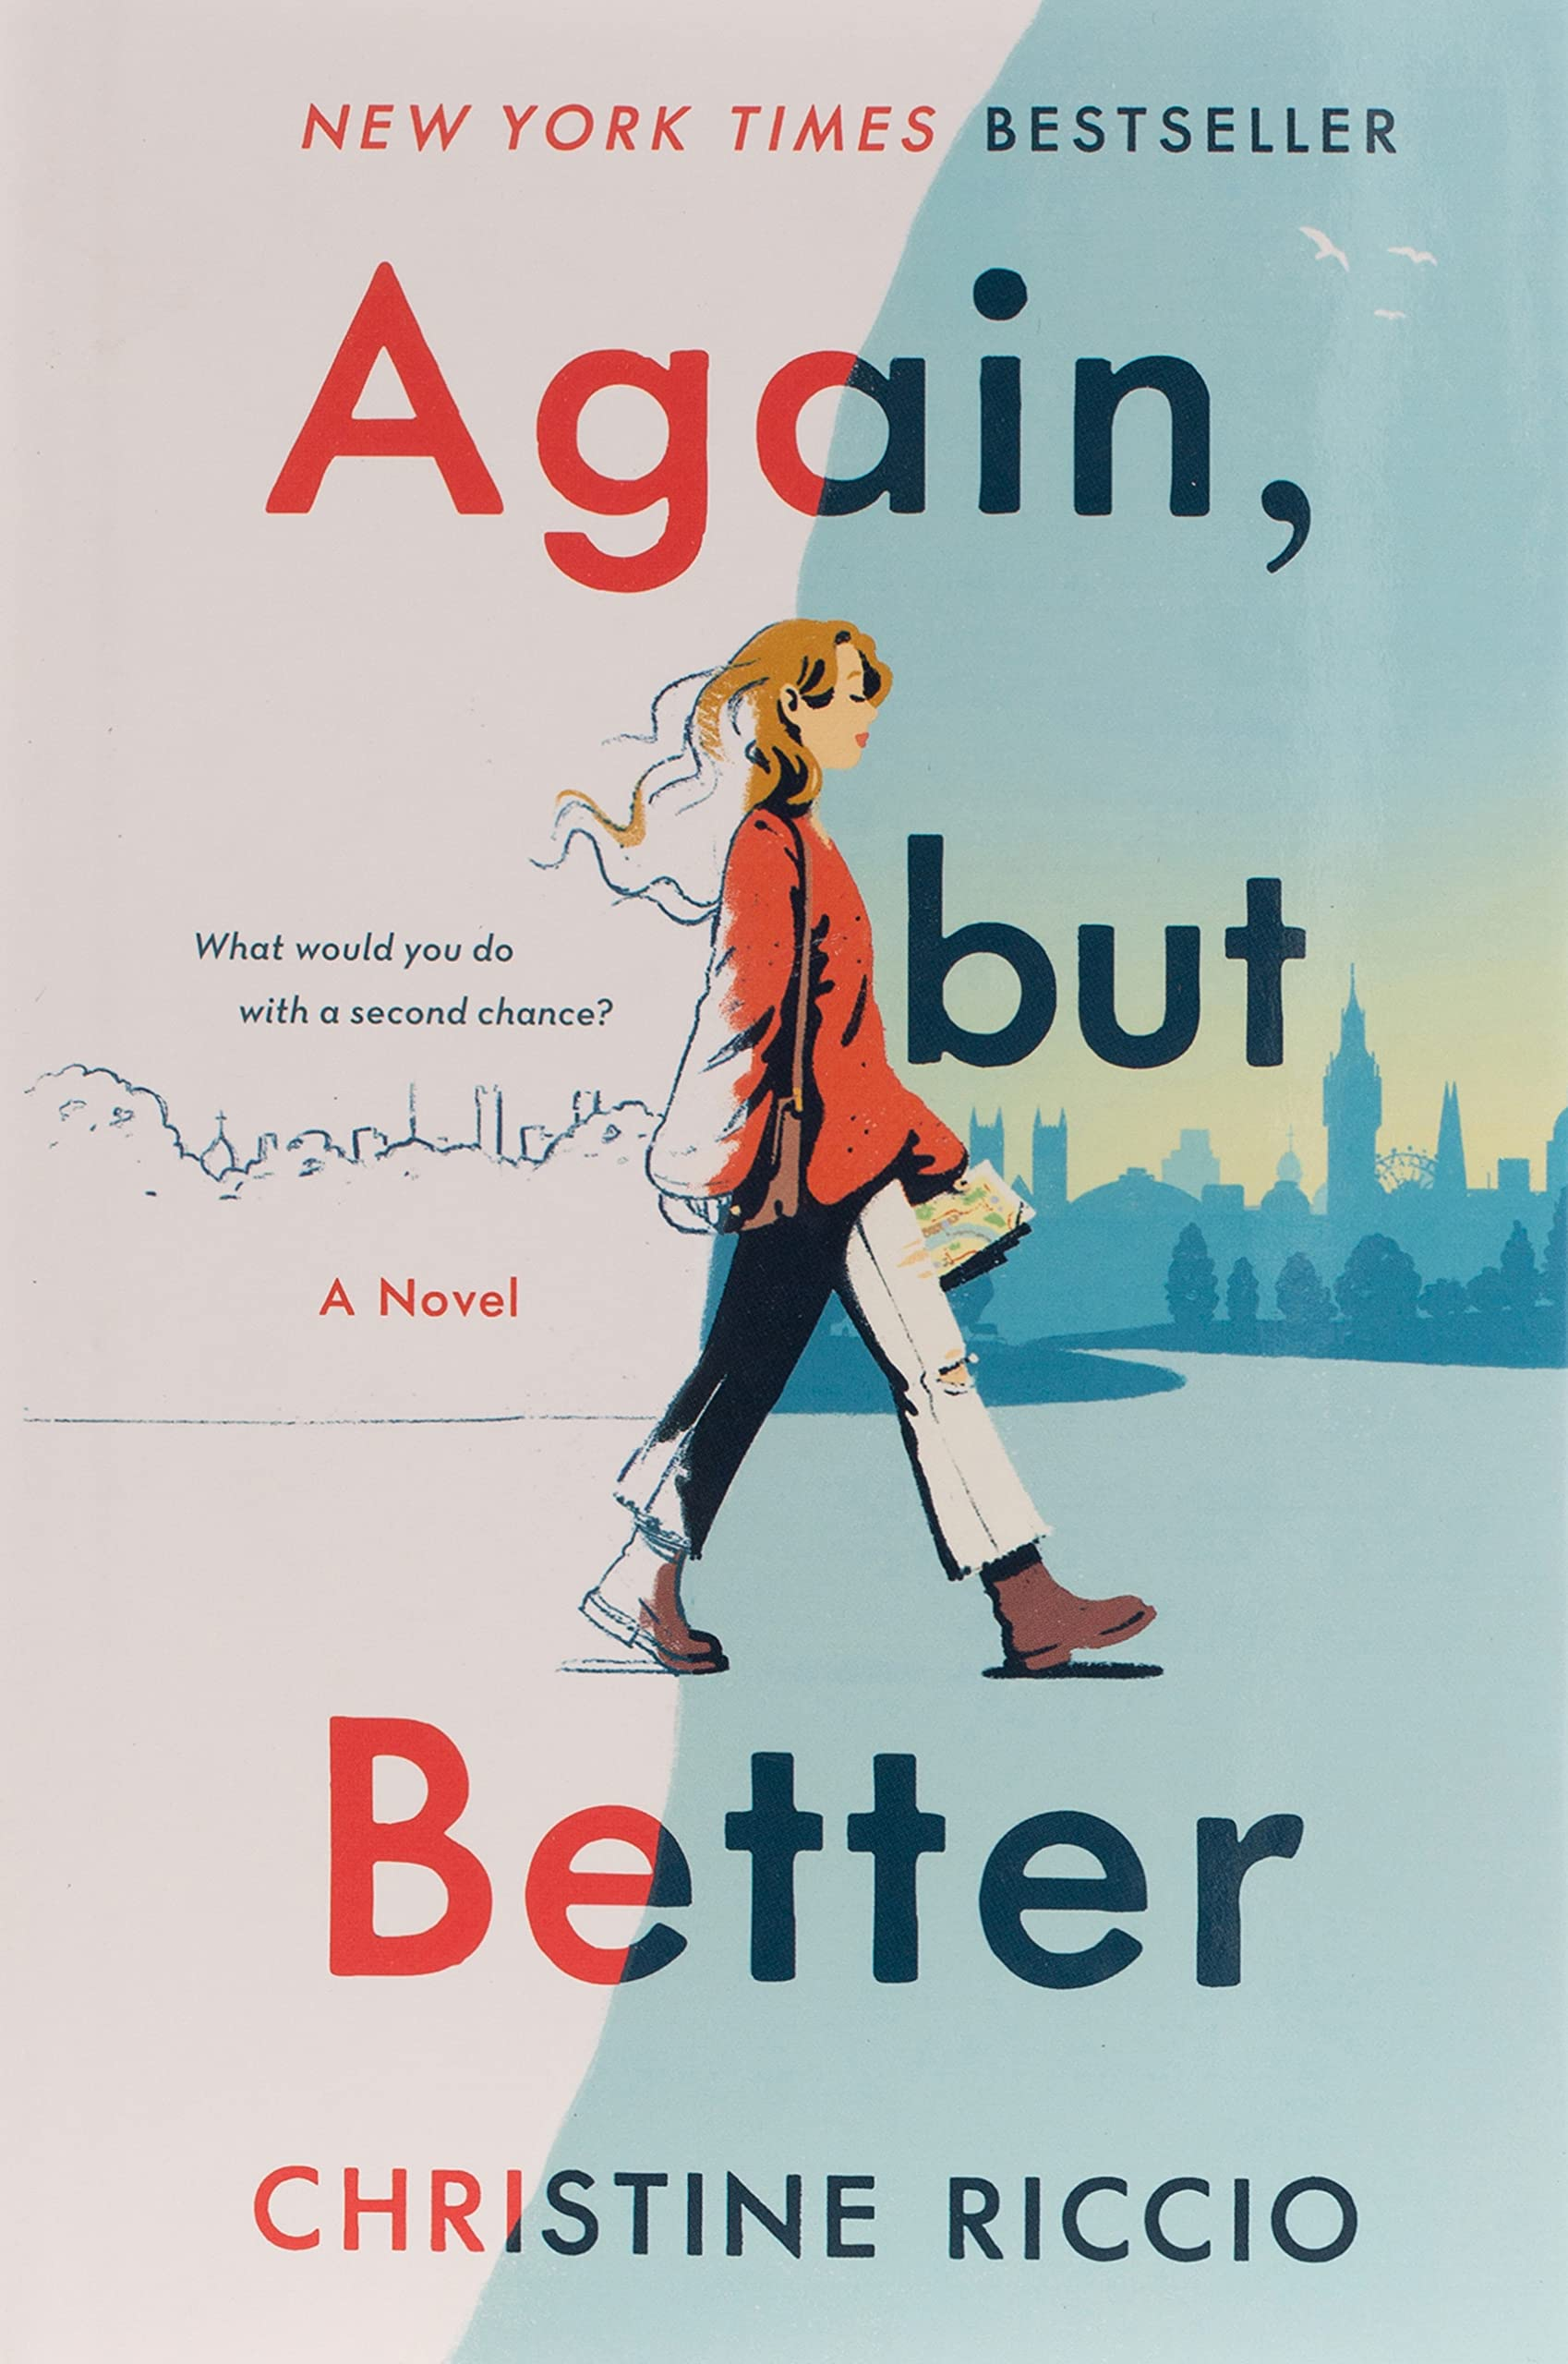 Amazon.com: Again, but Better: A Novel: 9781250299253: Riccio, Christine: Books